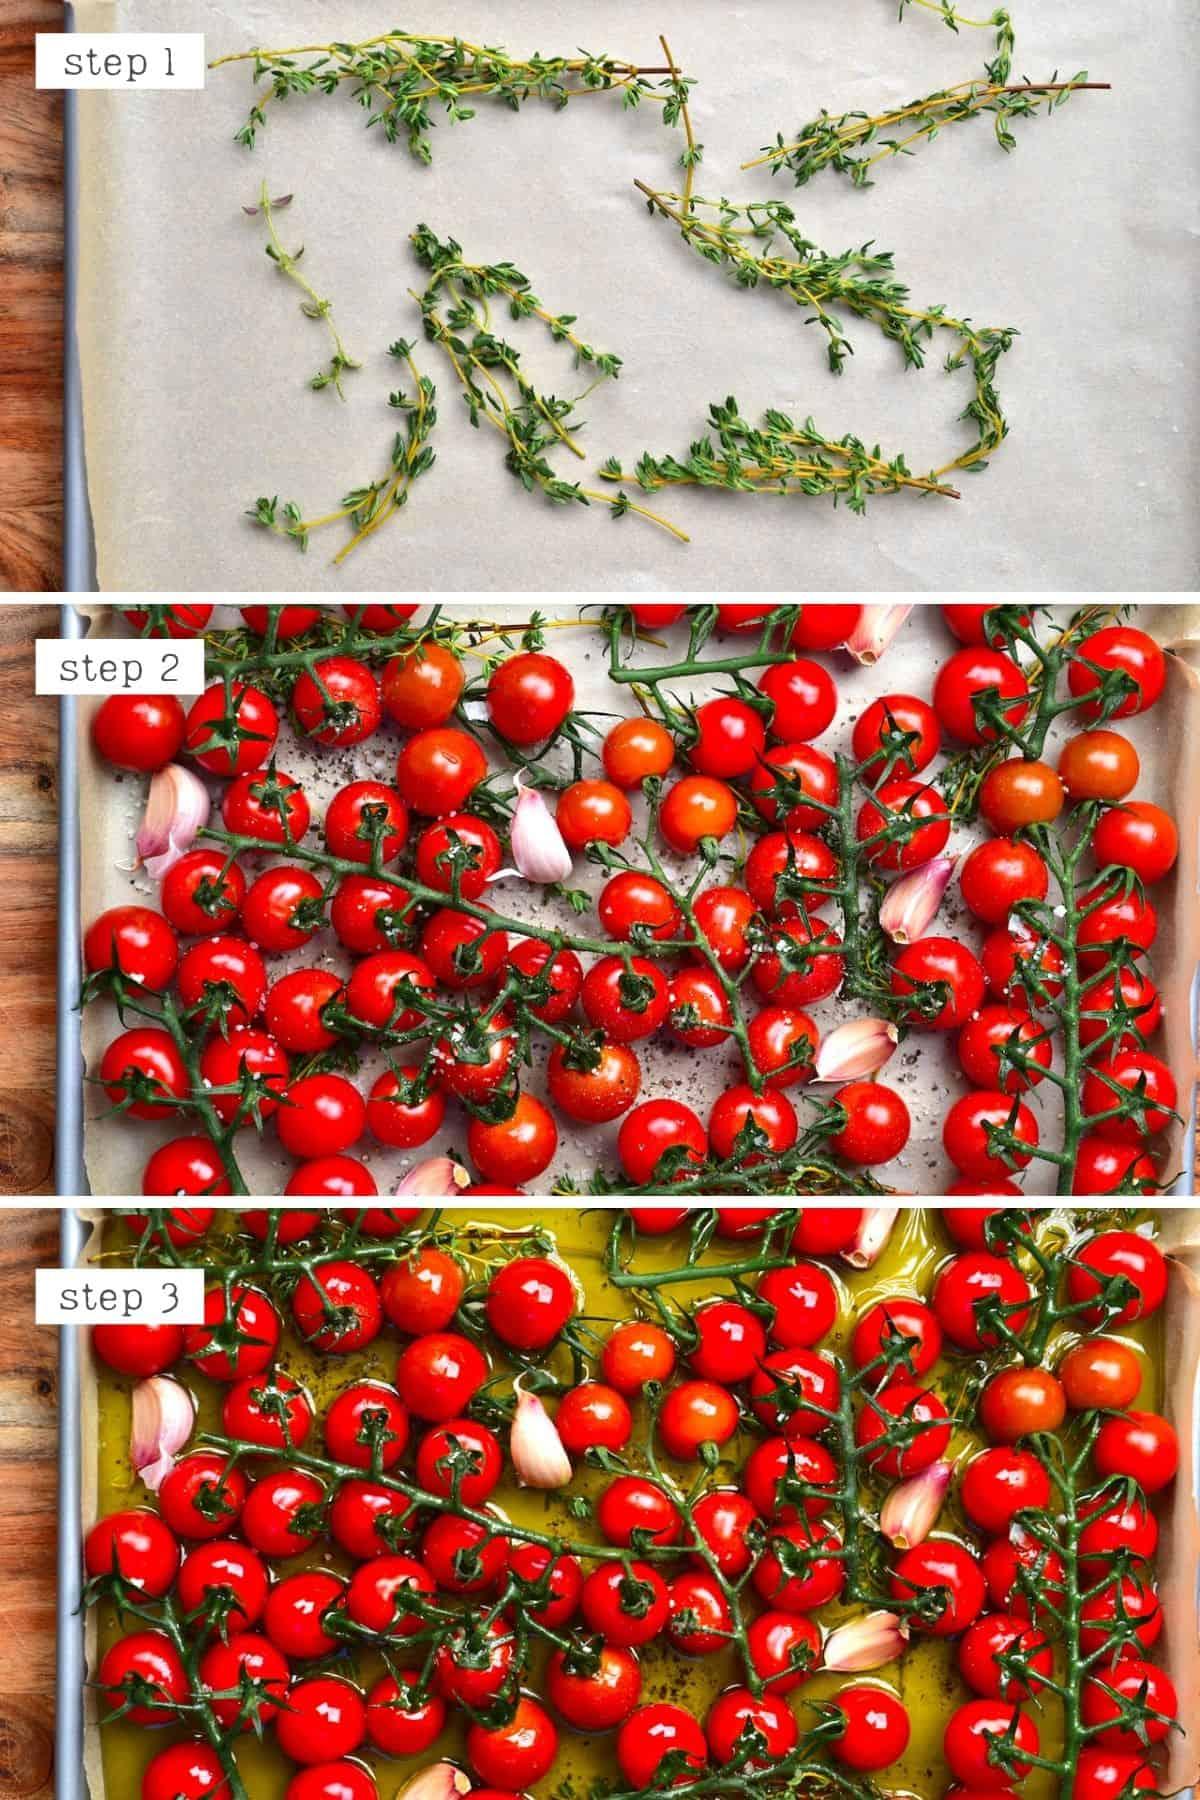 Steps for preparing tomato confit